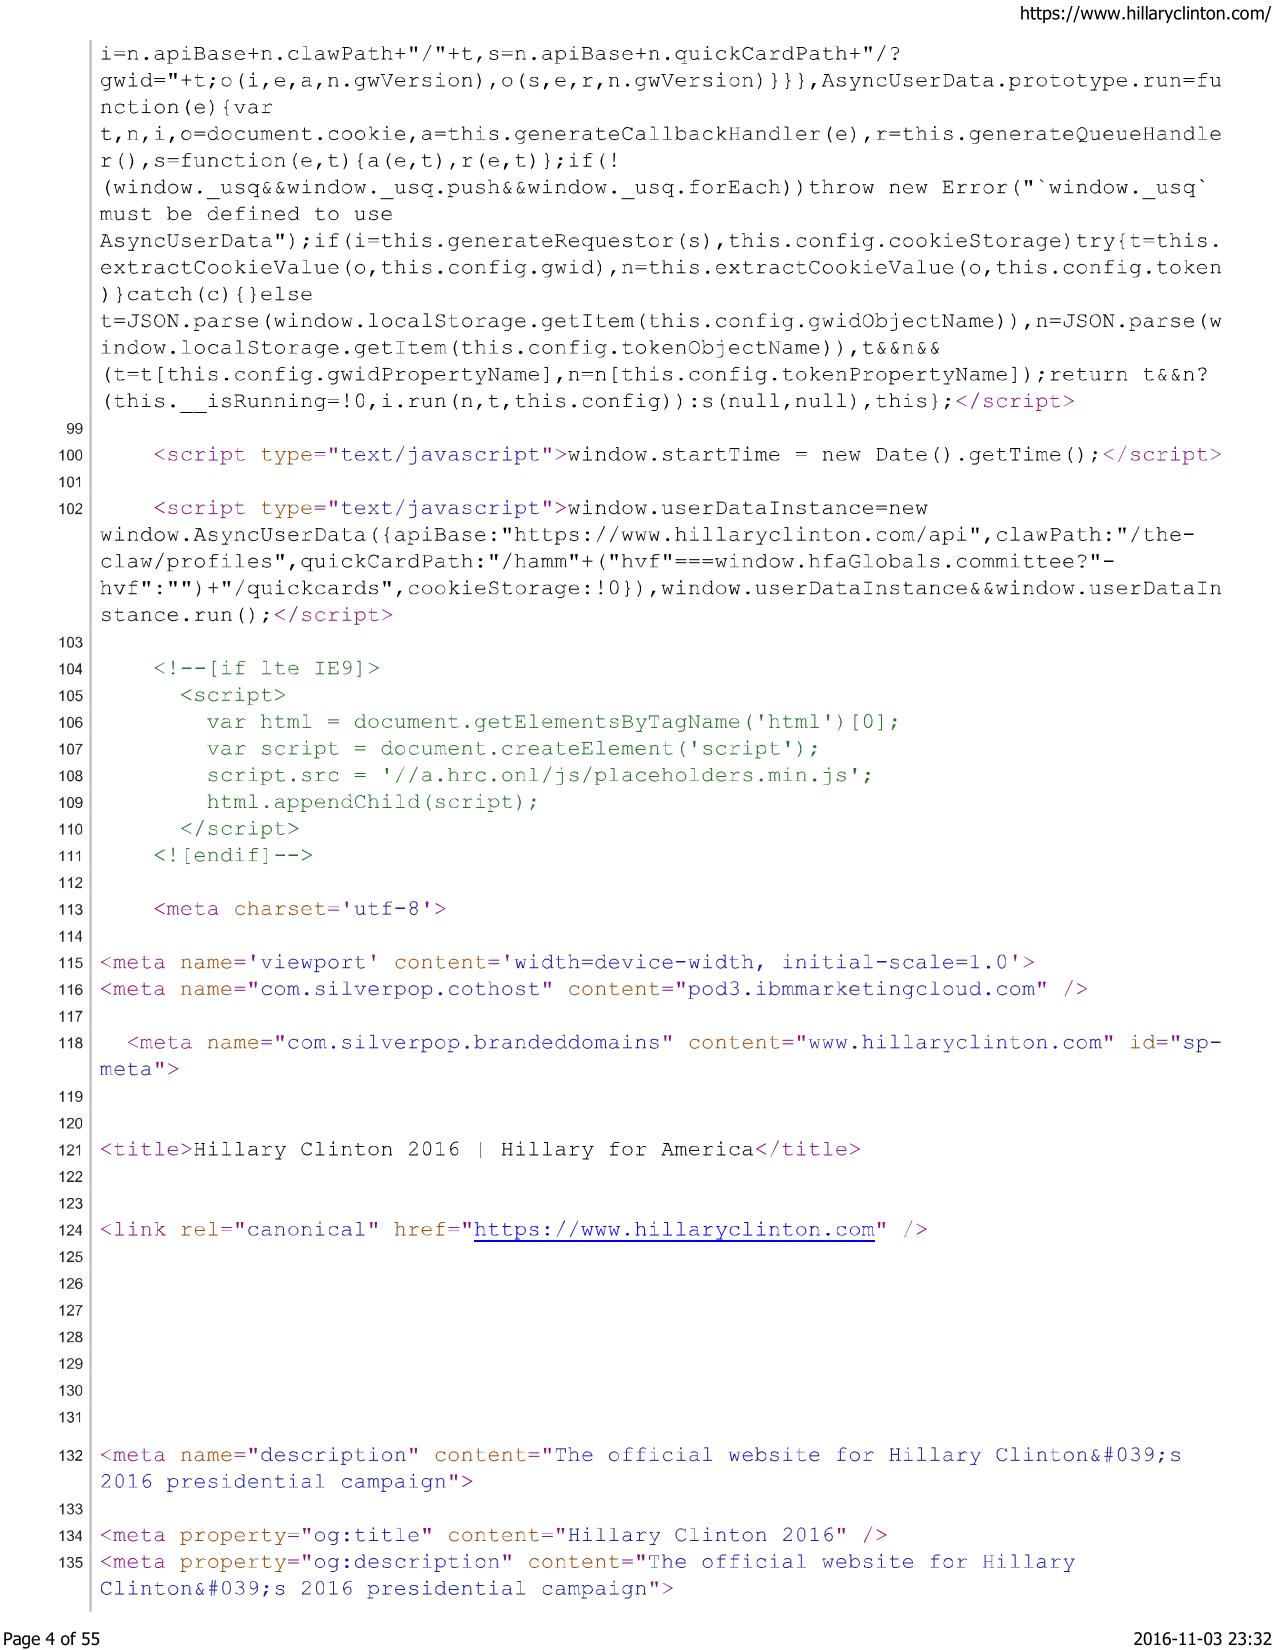 doctrine of constructive notice pdf